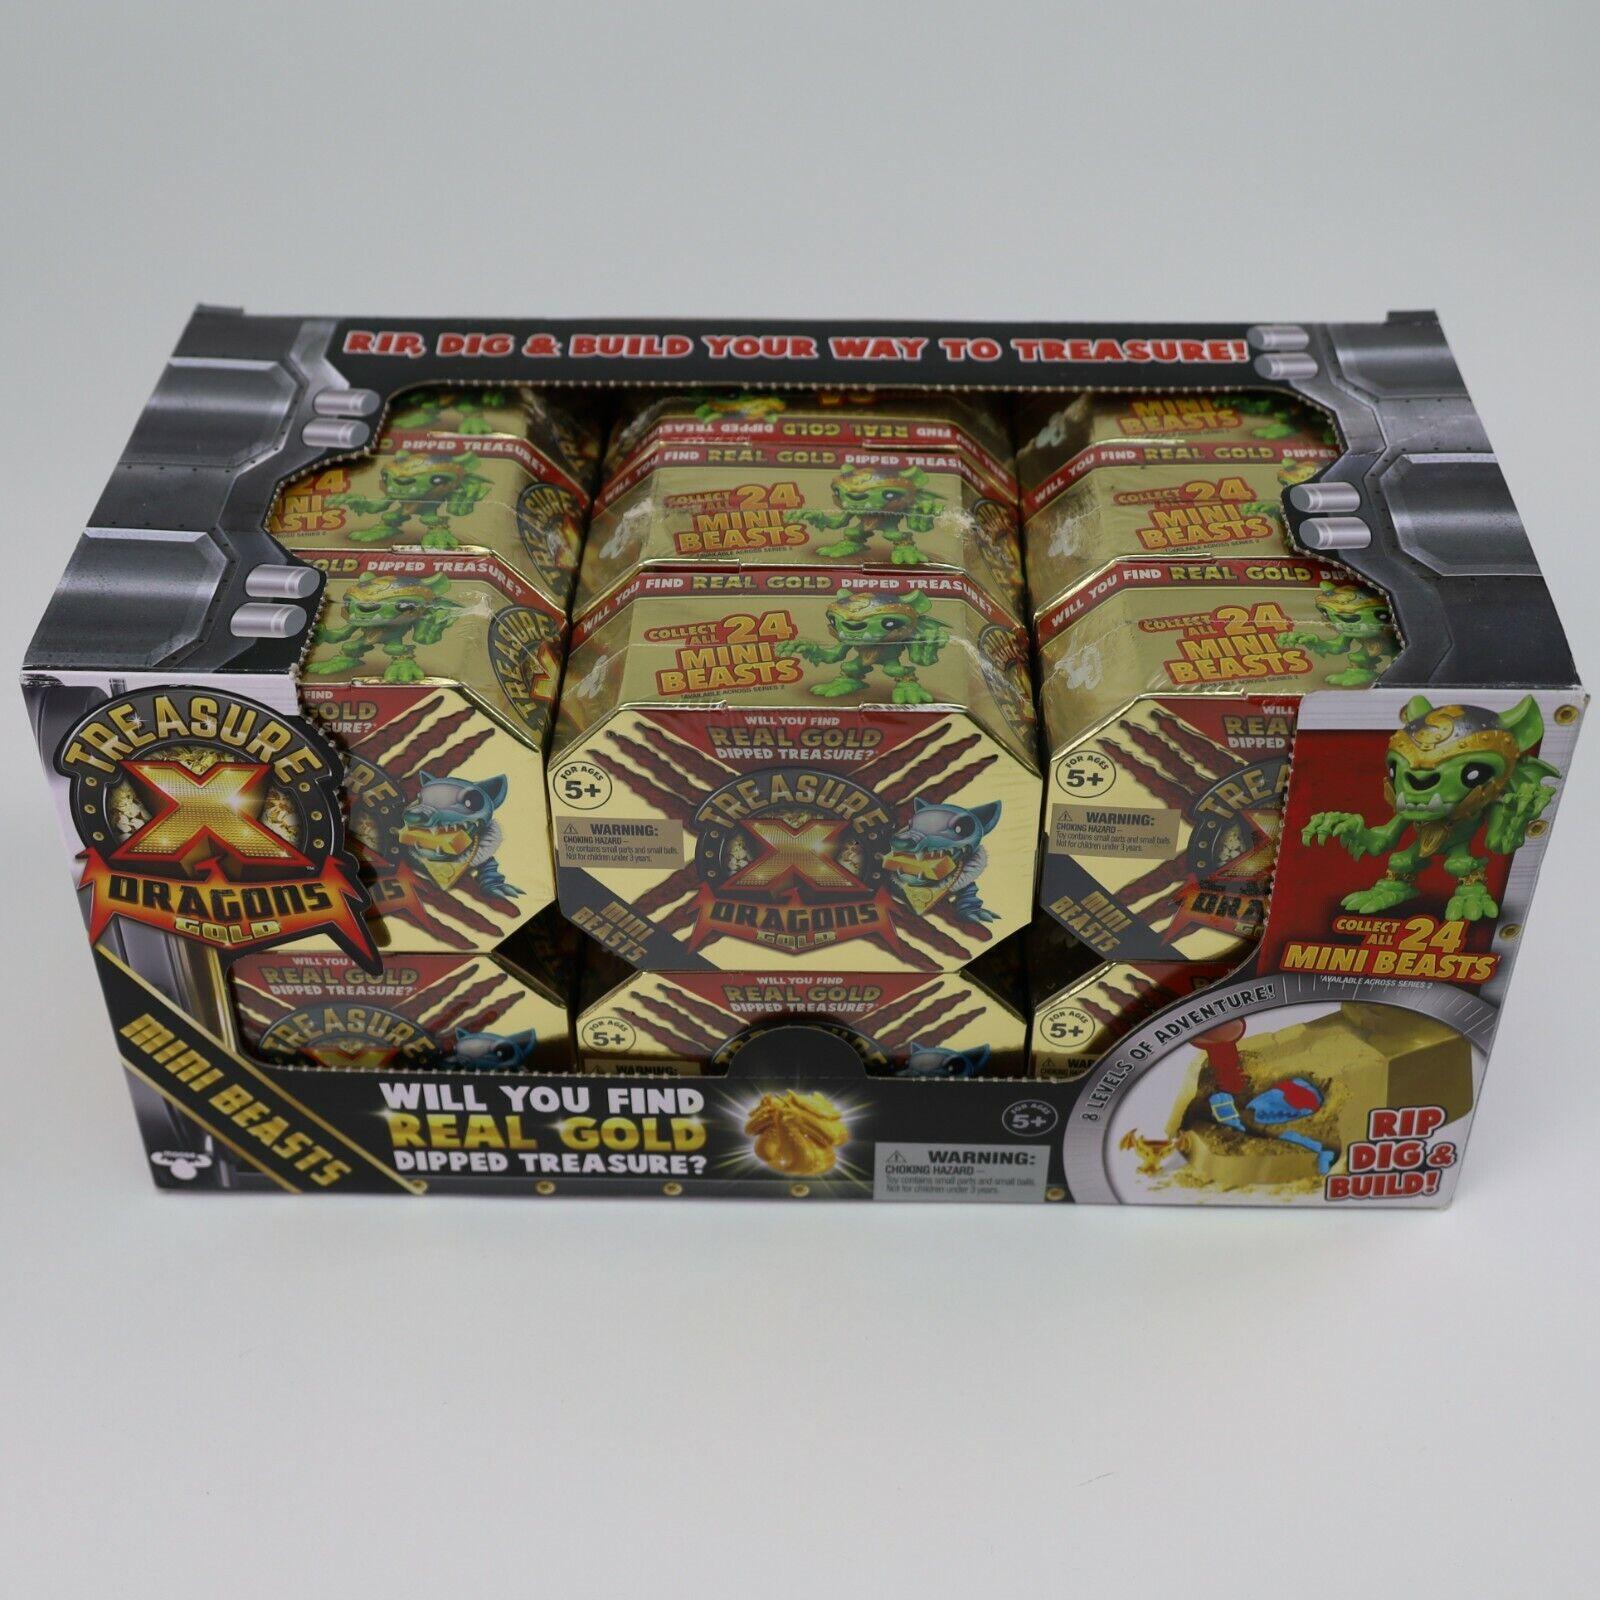 Treasure X Dragons Gold Mini Beasts Case Lot of 18 New Sealed Dragon Treasure For Sale - 2